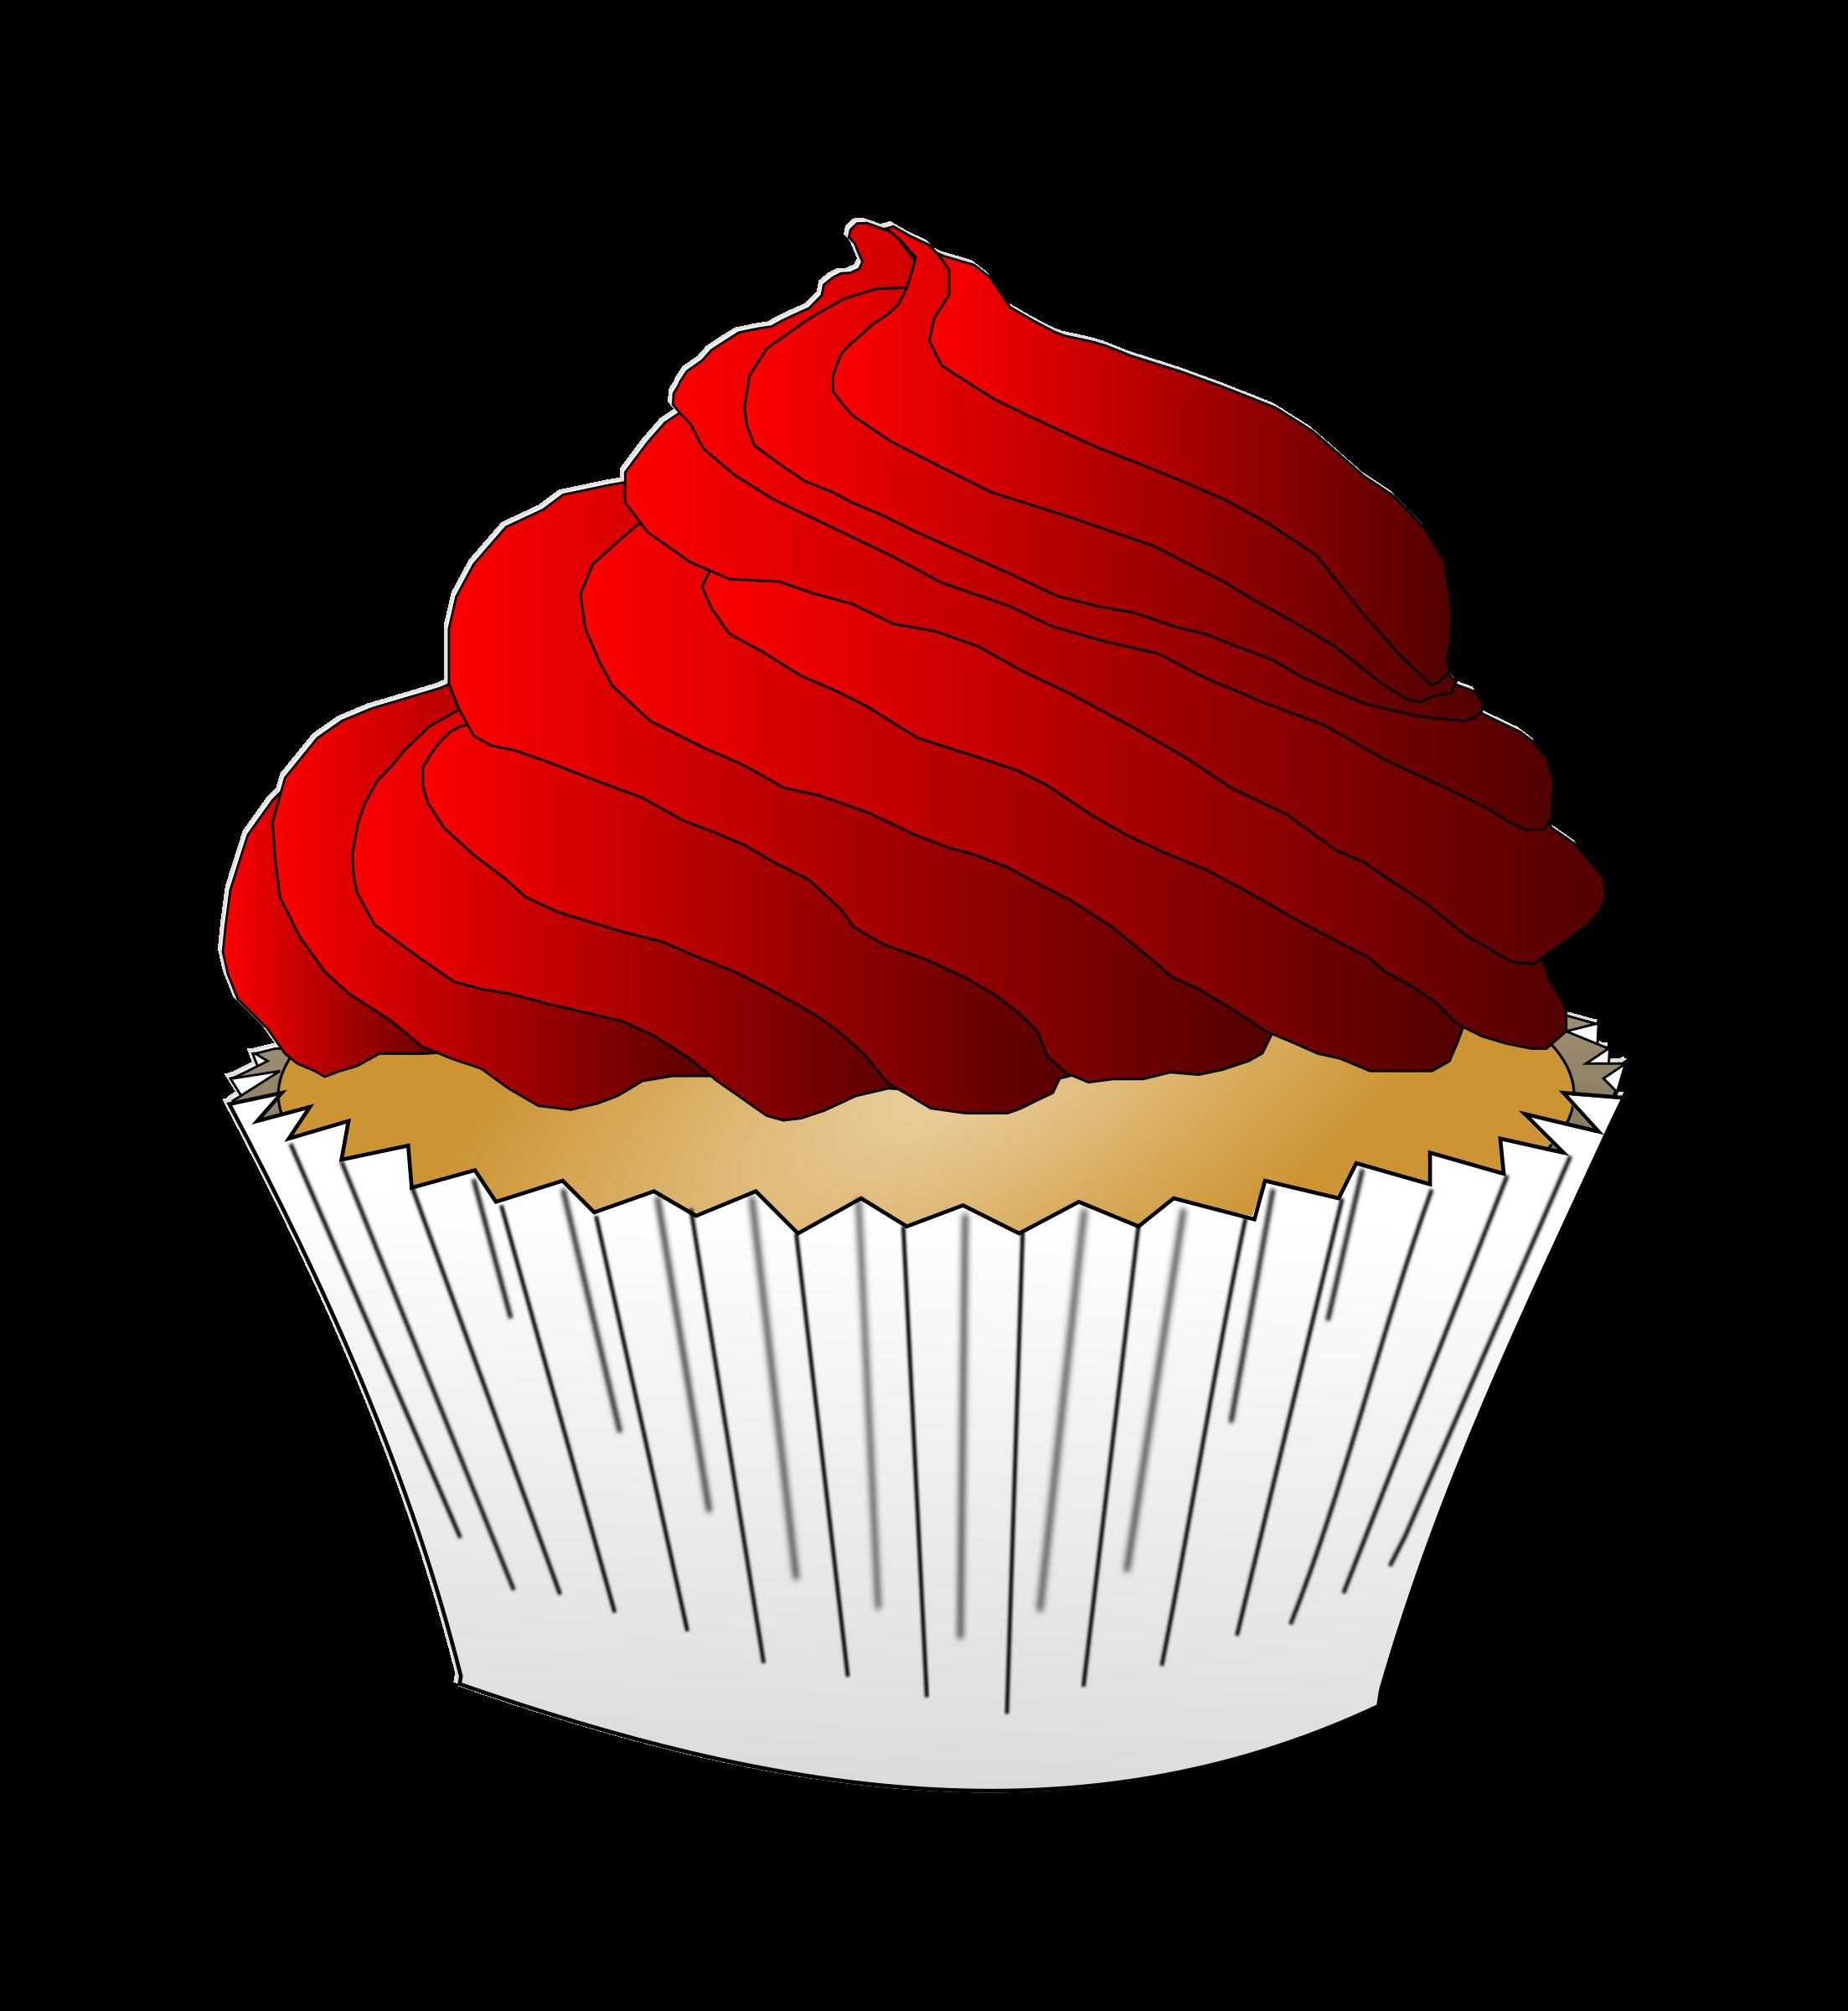 Vanilla pretty free collection. Cupcake clipart eye